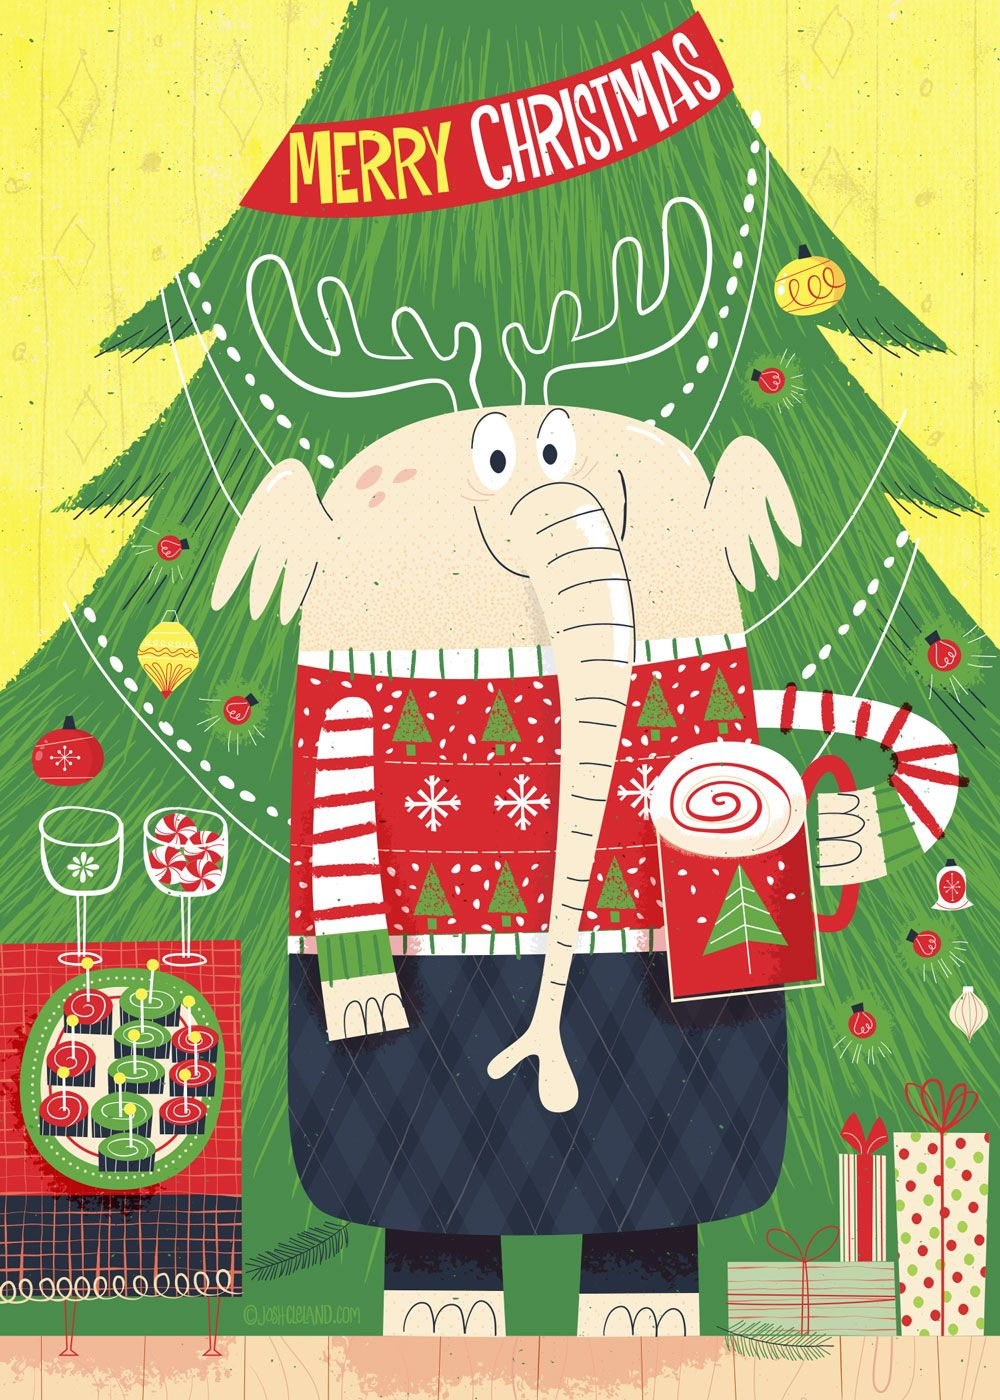 Larry the Christmas elephant by Josh Cleland